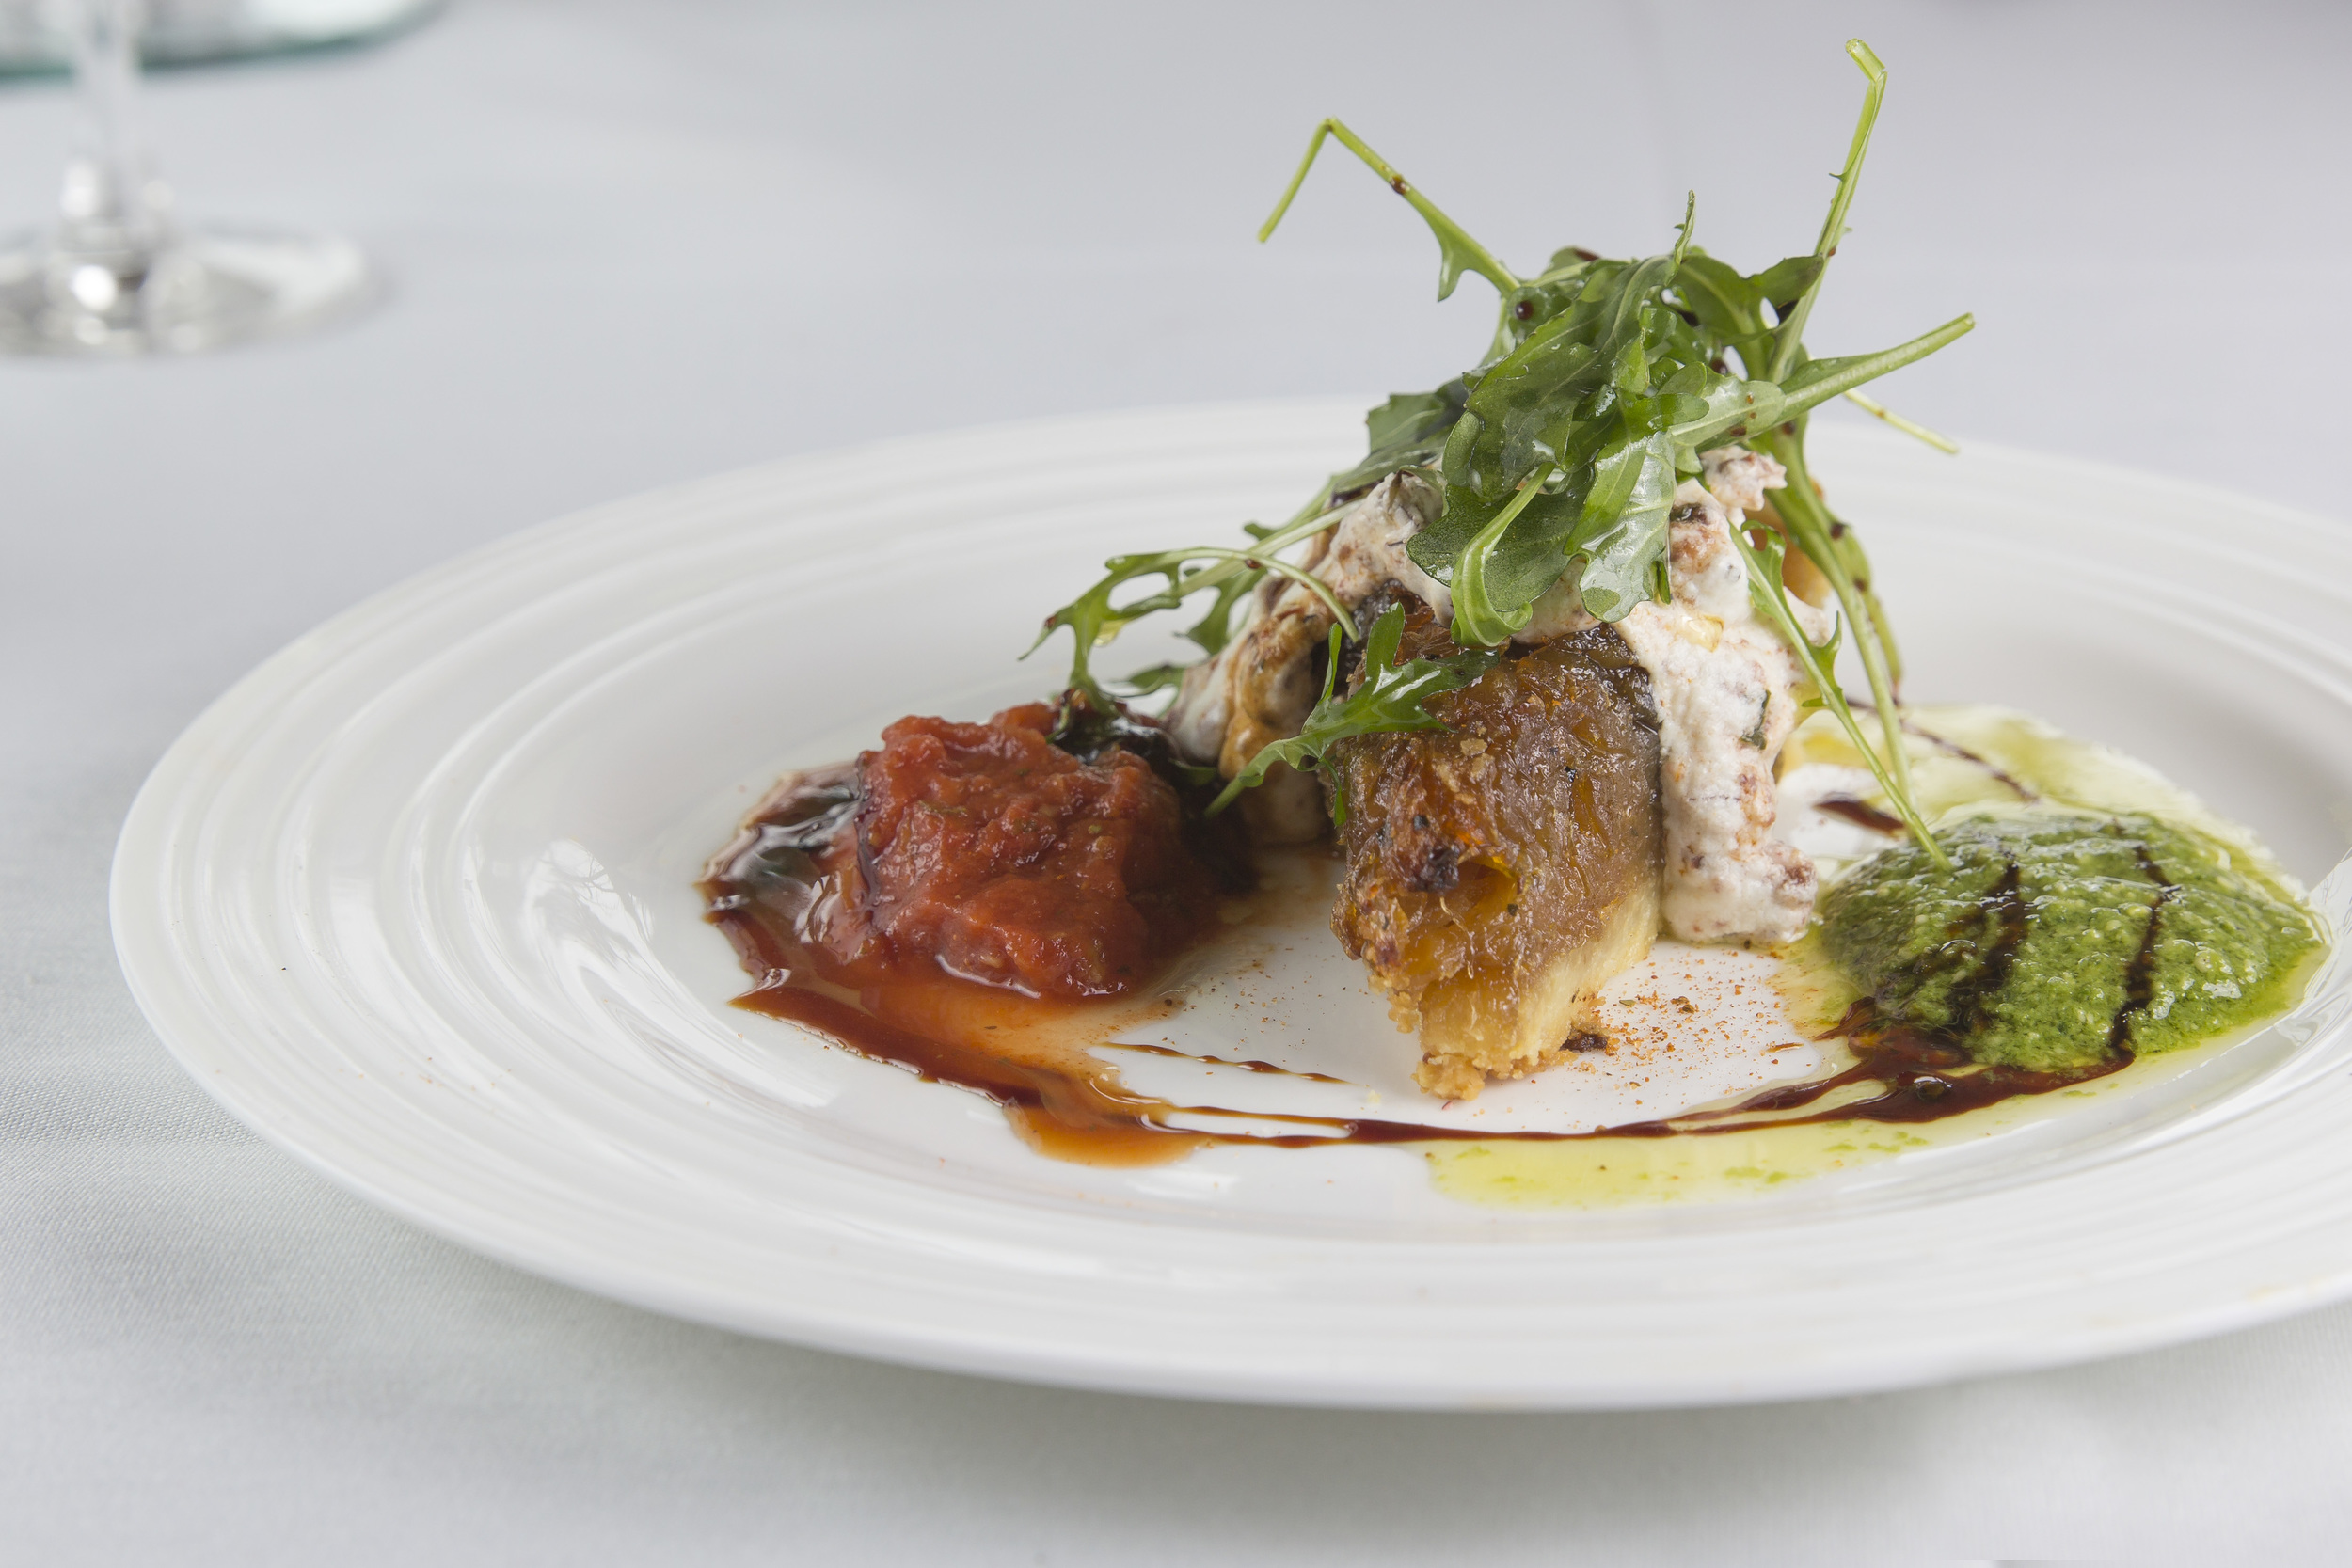 160121_Sperata_restaurant_food.0023.jpg